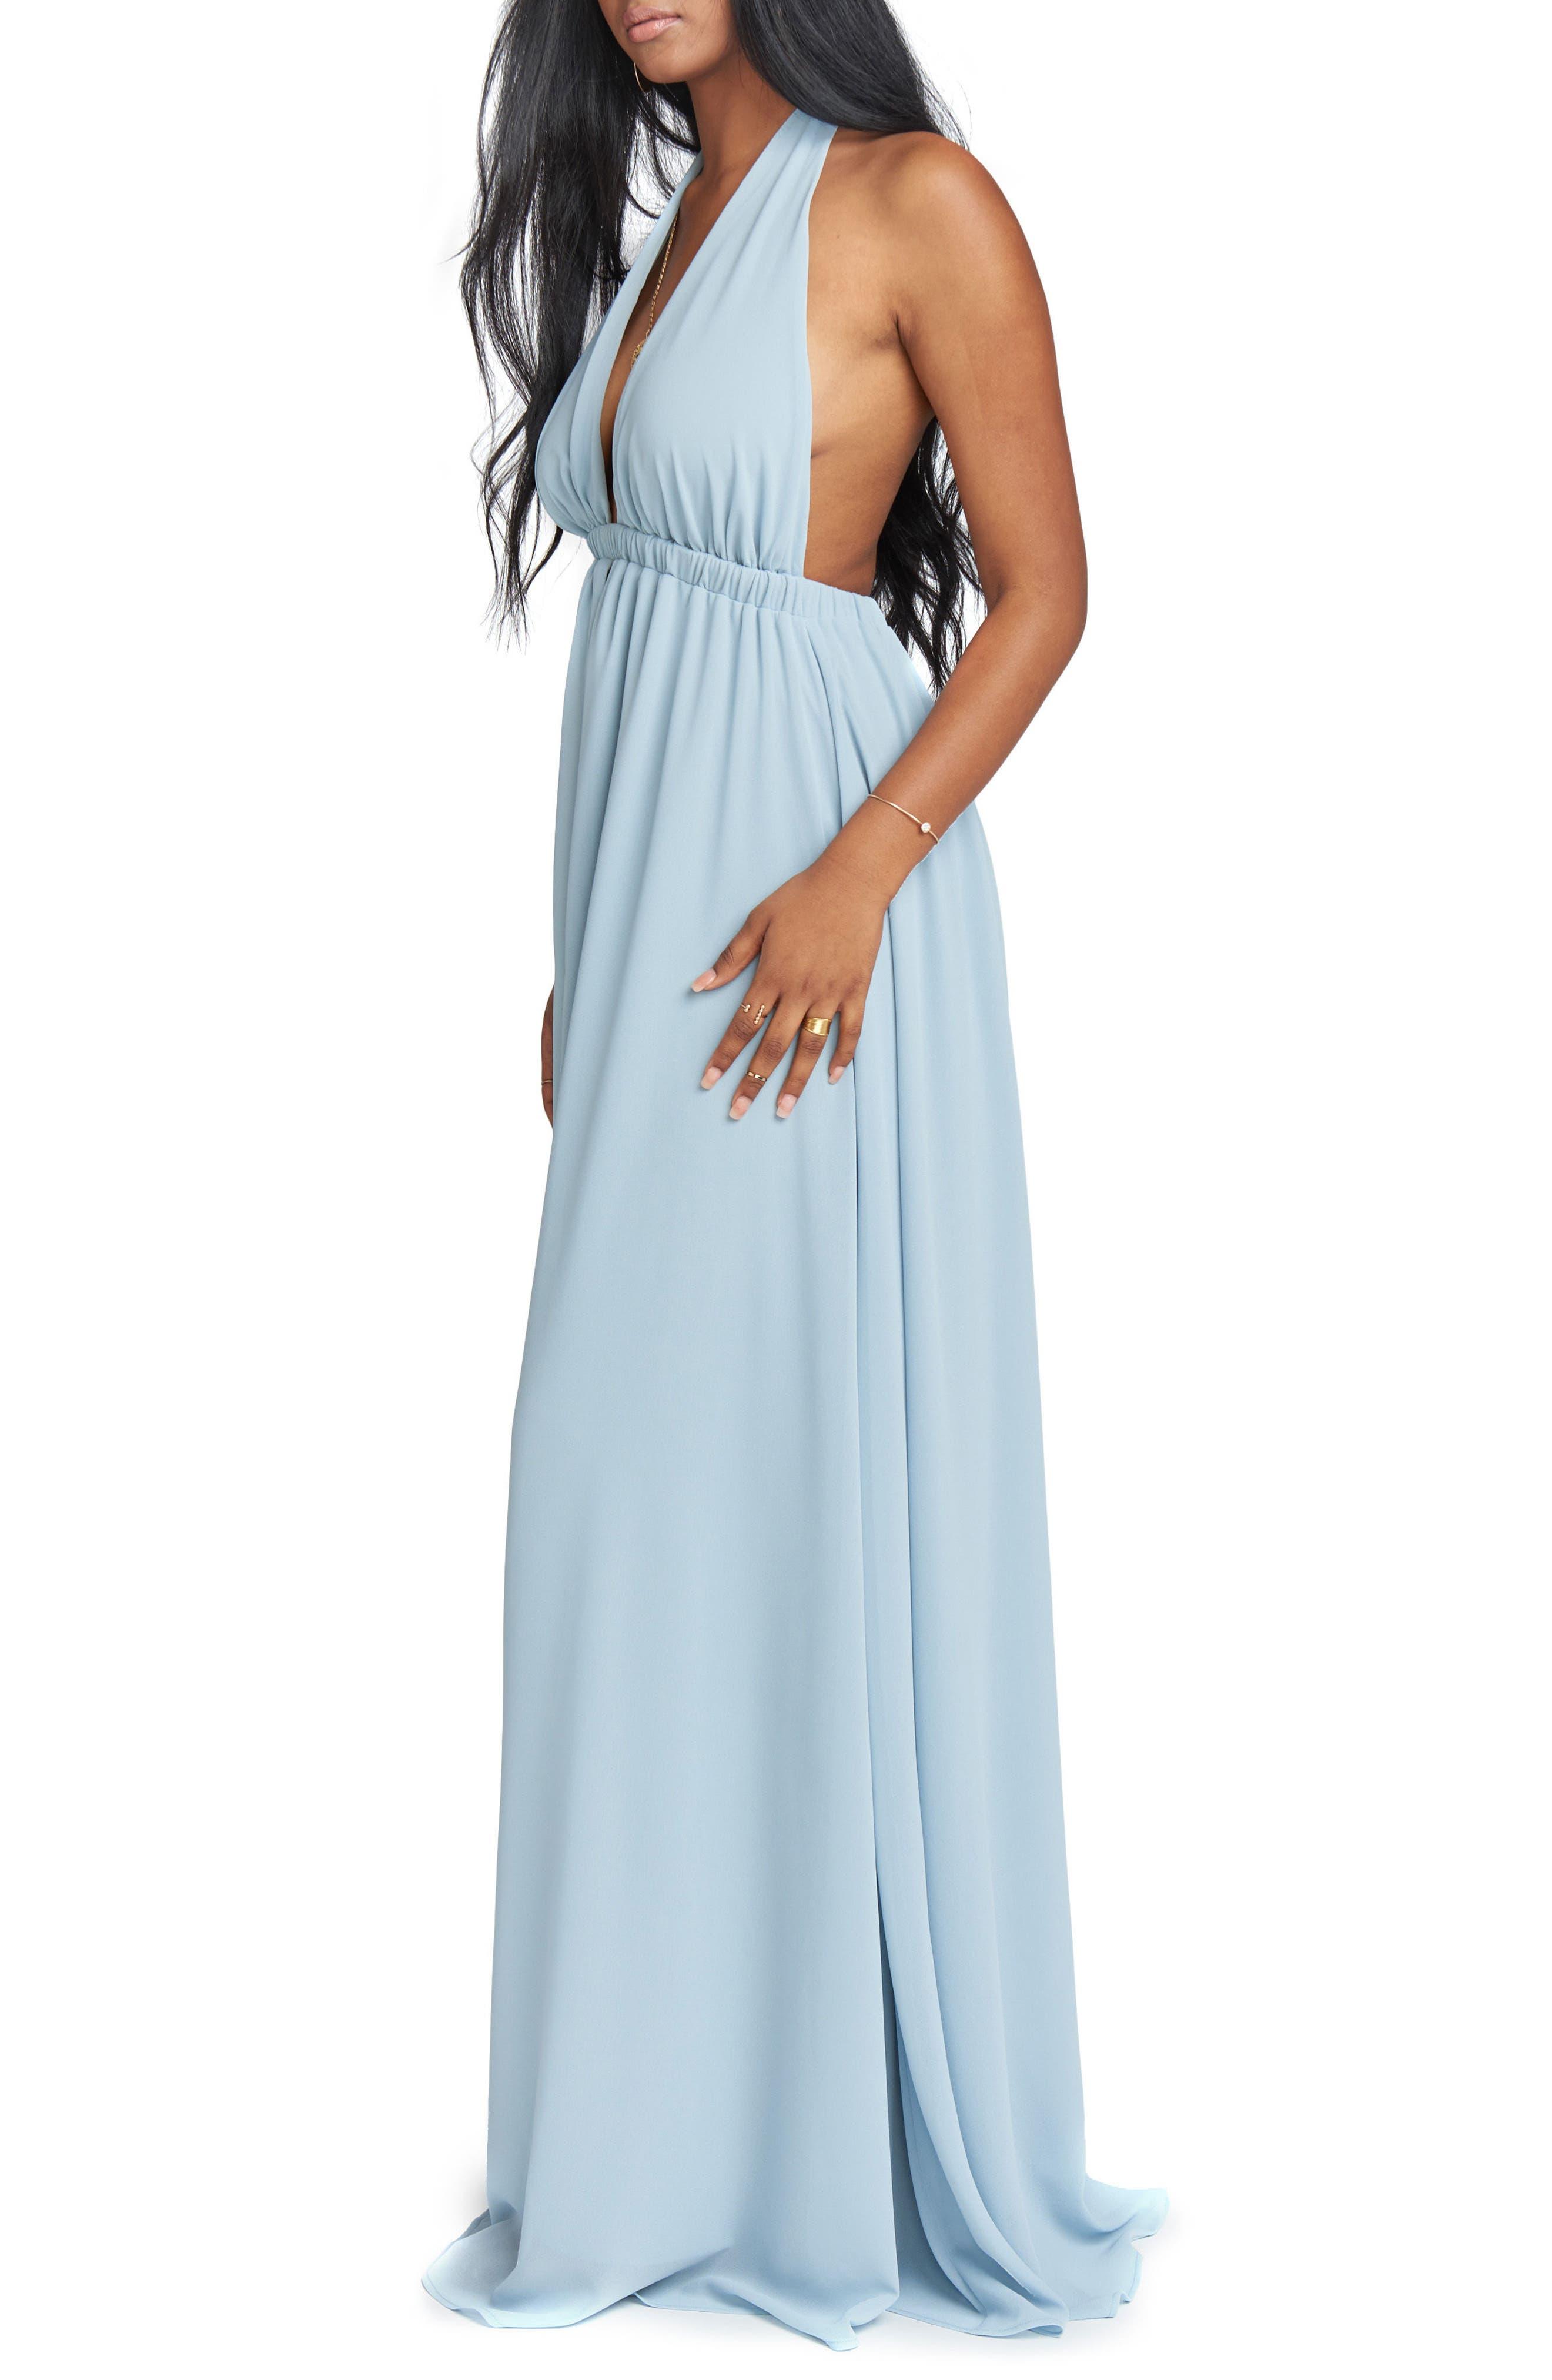 Luna Halter Gown,                             Alternate thumbnail 3, color,                             Steel Blue